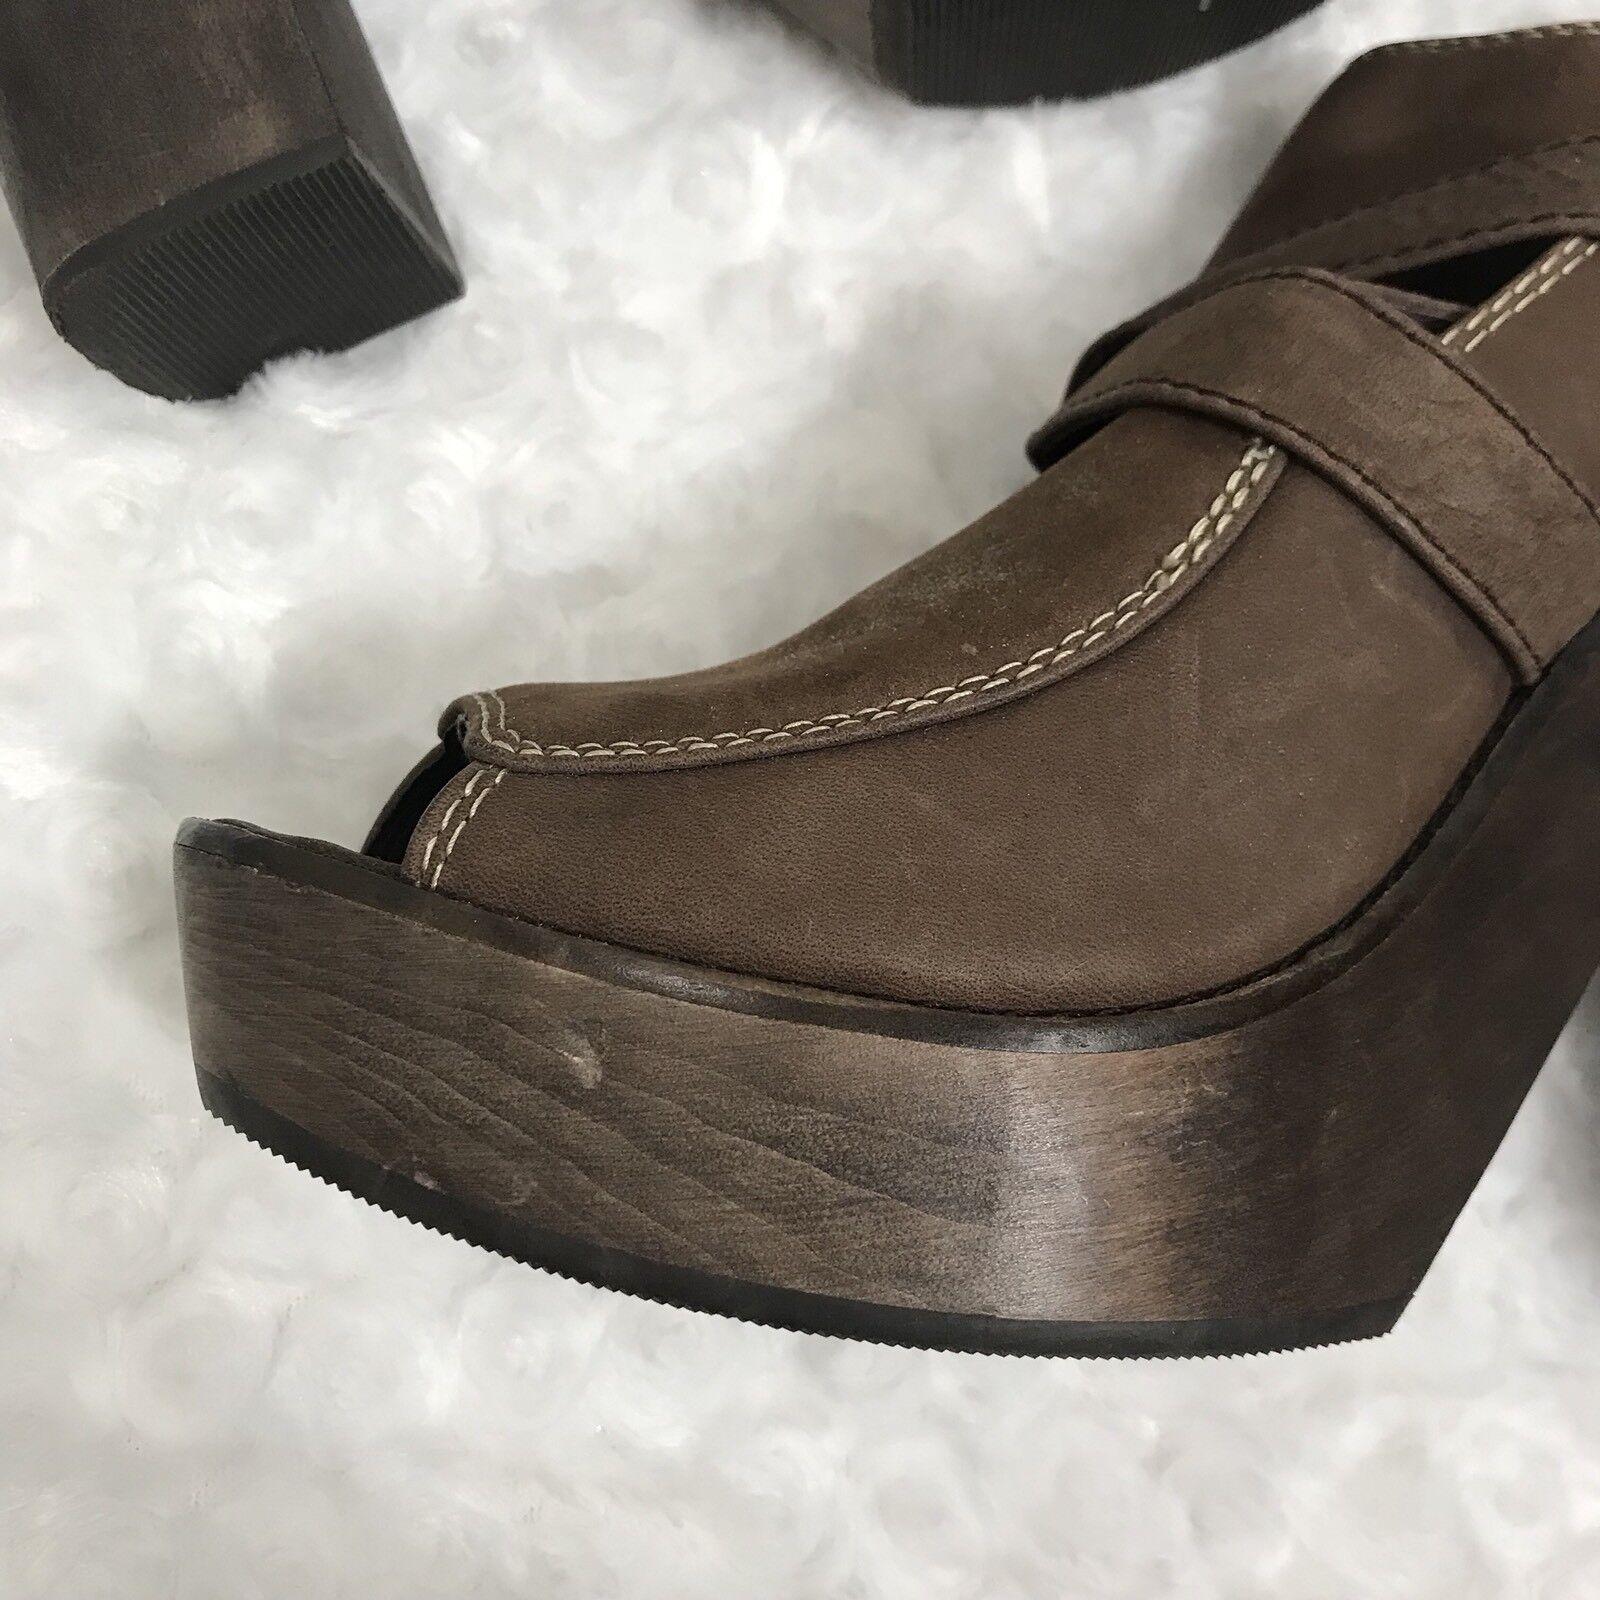 Joie Joie Joie 39.5 9.5 Rare Peep Toe Leather Wooden Platform Ankle Stiefel Stiefelie Clog Heel 51225f